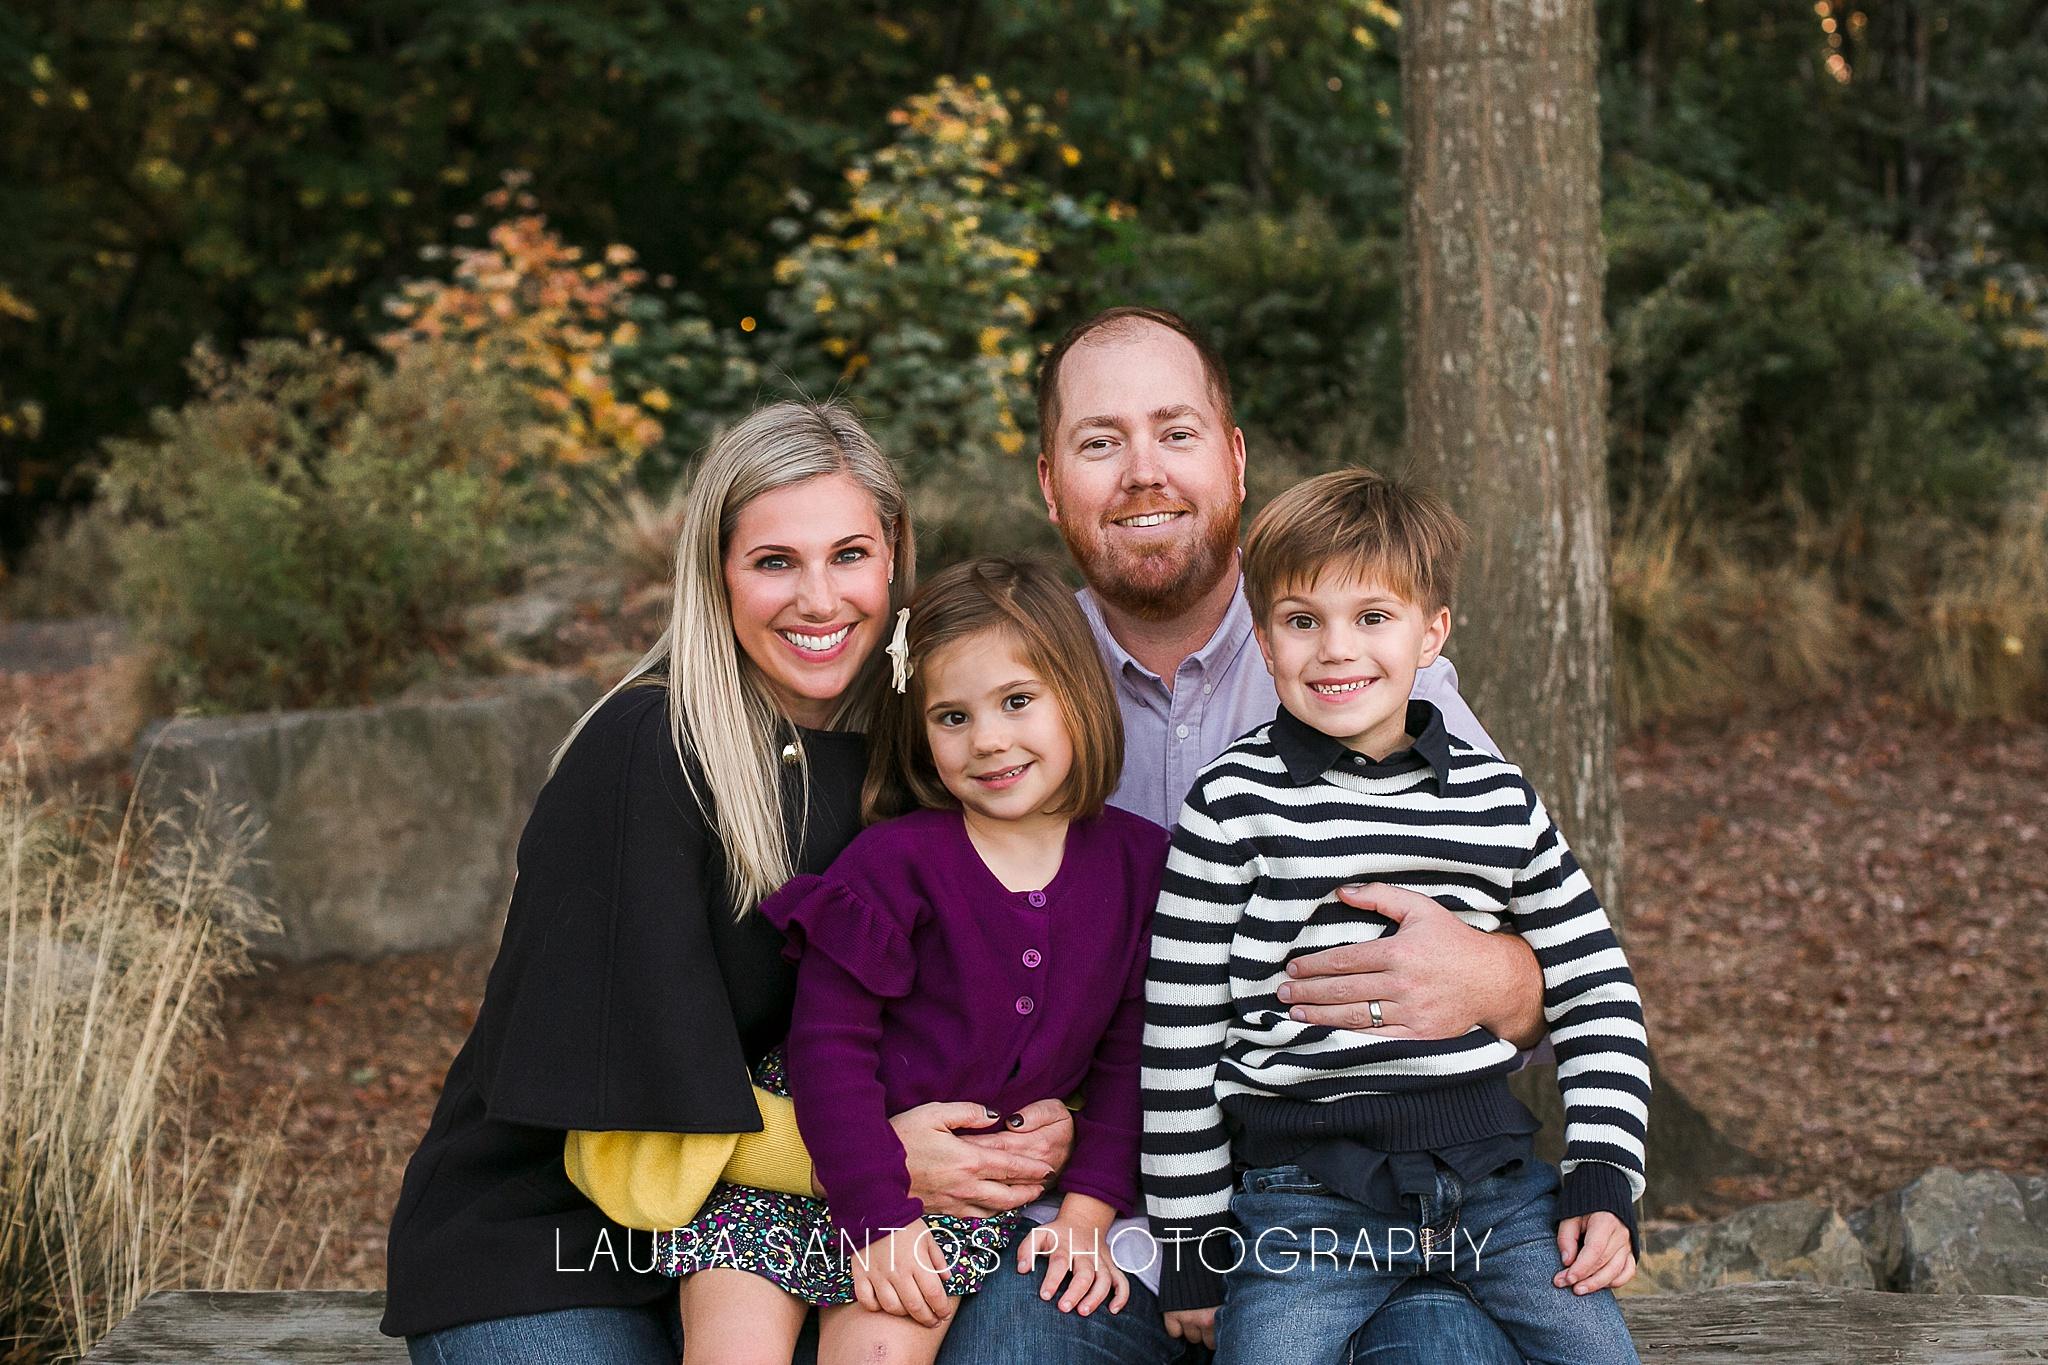 Laura Santos Photography Portland Oregon Family Photographer_0846.jpg